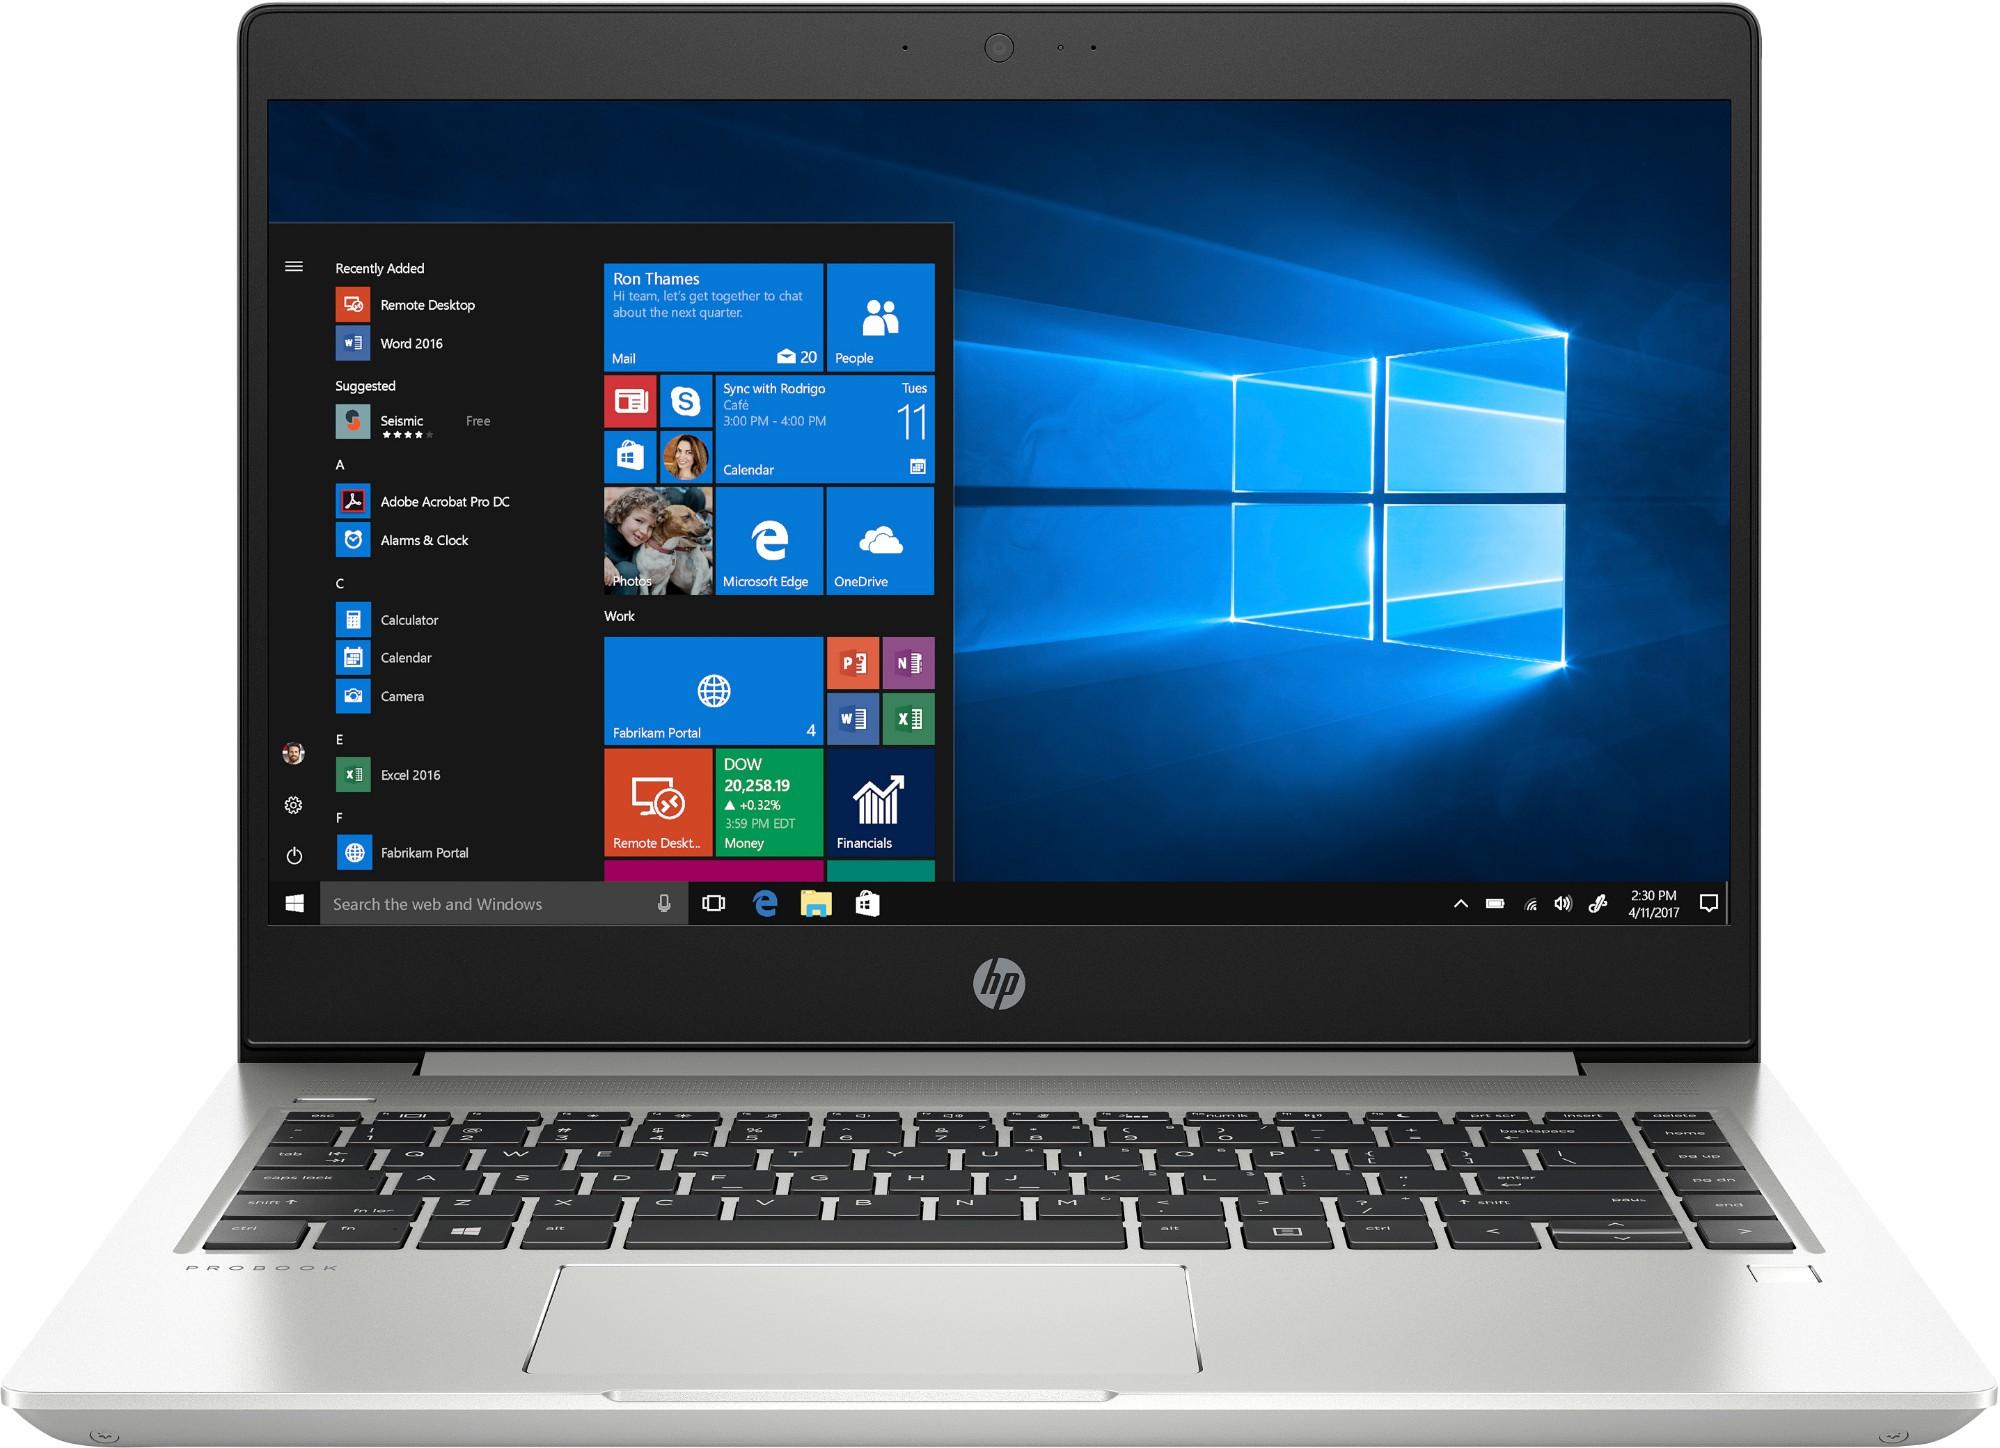 "HP ProBook 440 G6 + 14.1 Business Slim Top Load Zilver Notebook 35,6 cm (14"") 1920 x 1080 Pixels Intel® 8ste generatie Core™ i5 8 GB DDR4-SDRAM 256 GB SSD Windows 10 Pro"